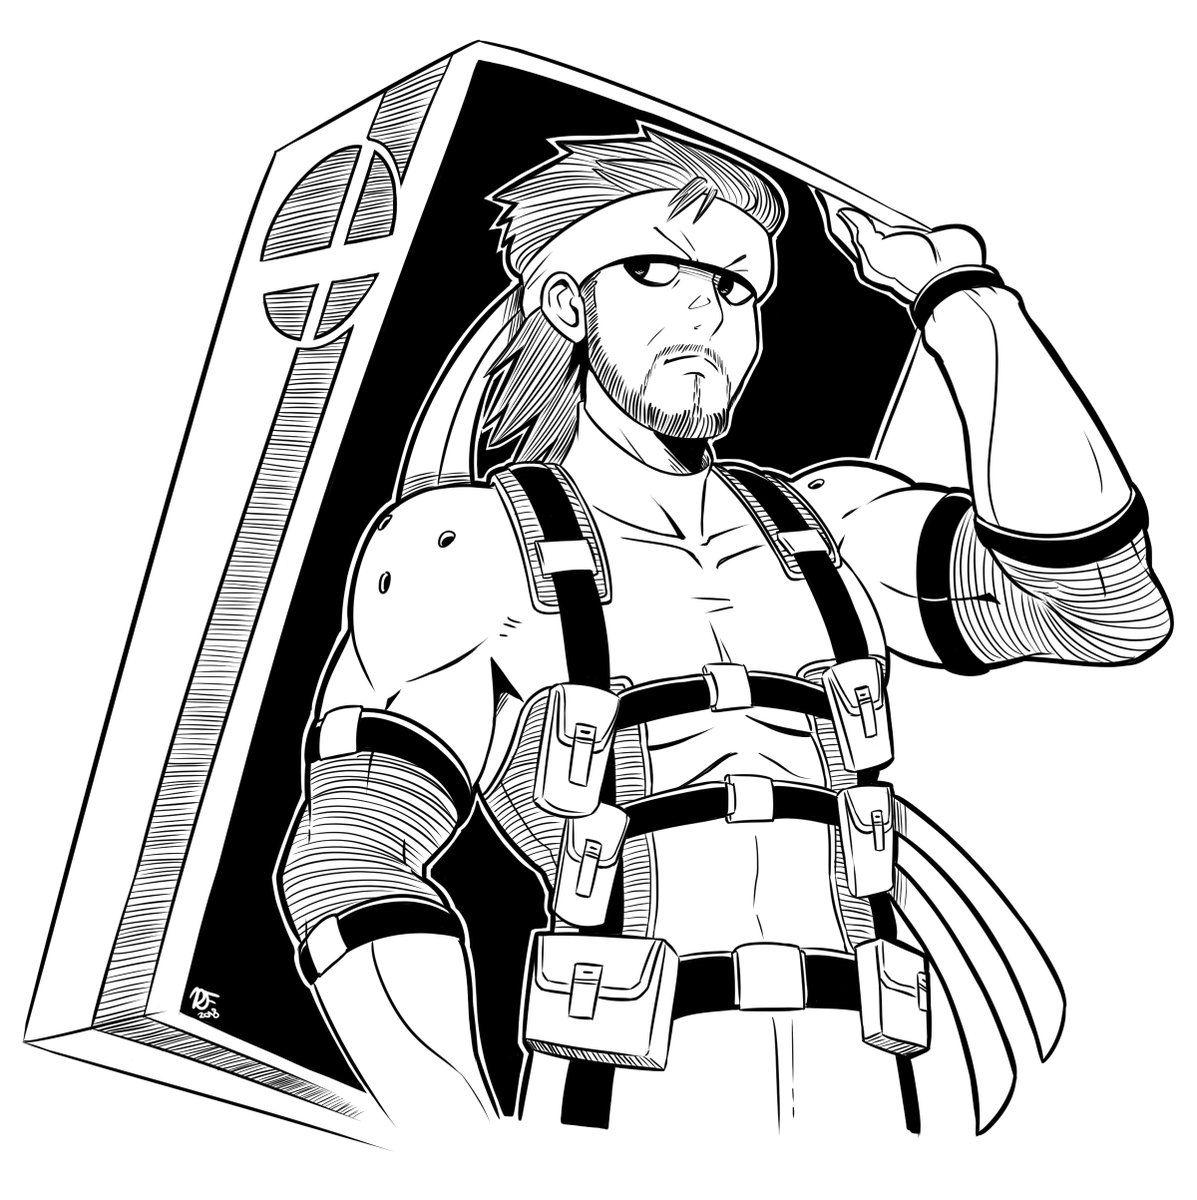 Russ on | Super smash bros, Snake metal gear, Metal gear